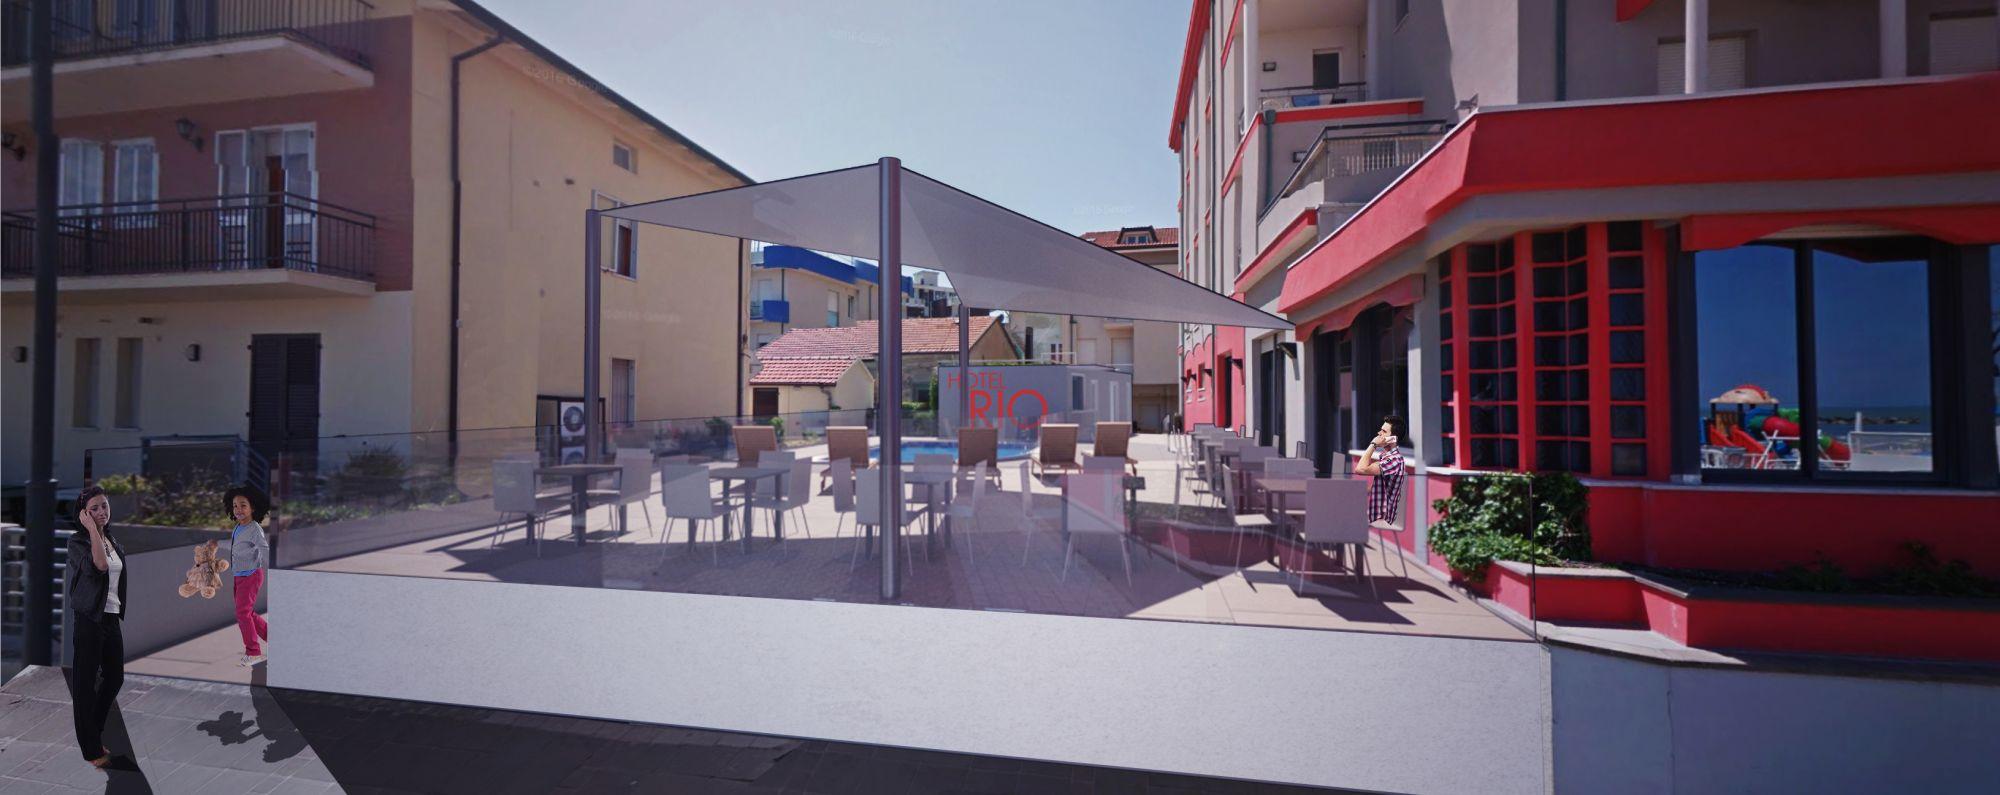 Hotel a bellaria igea marina con piscina e idromassaggio hotel rio bellaria - Hotel con piscina bellaria ...